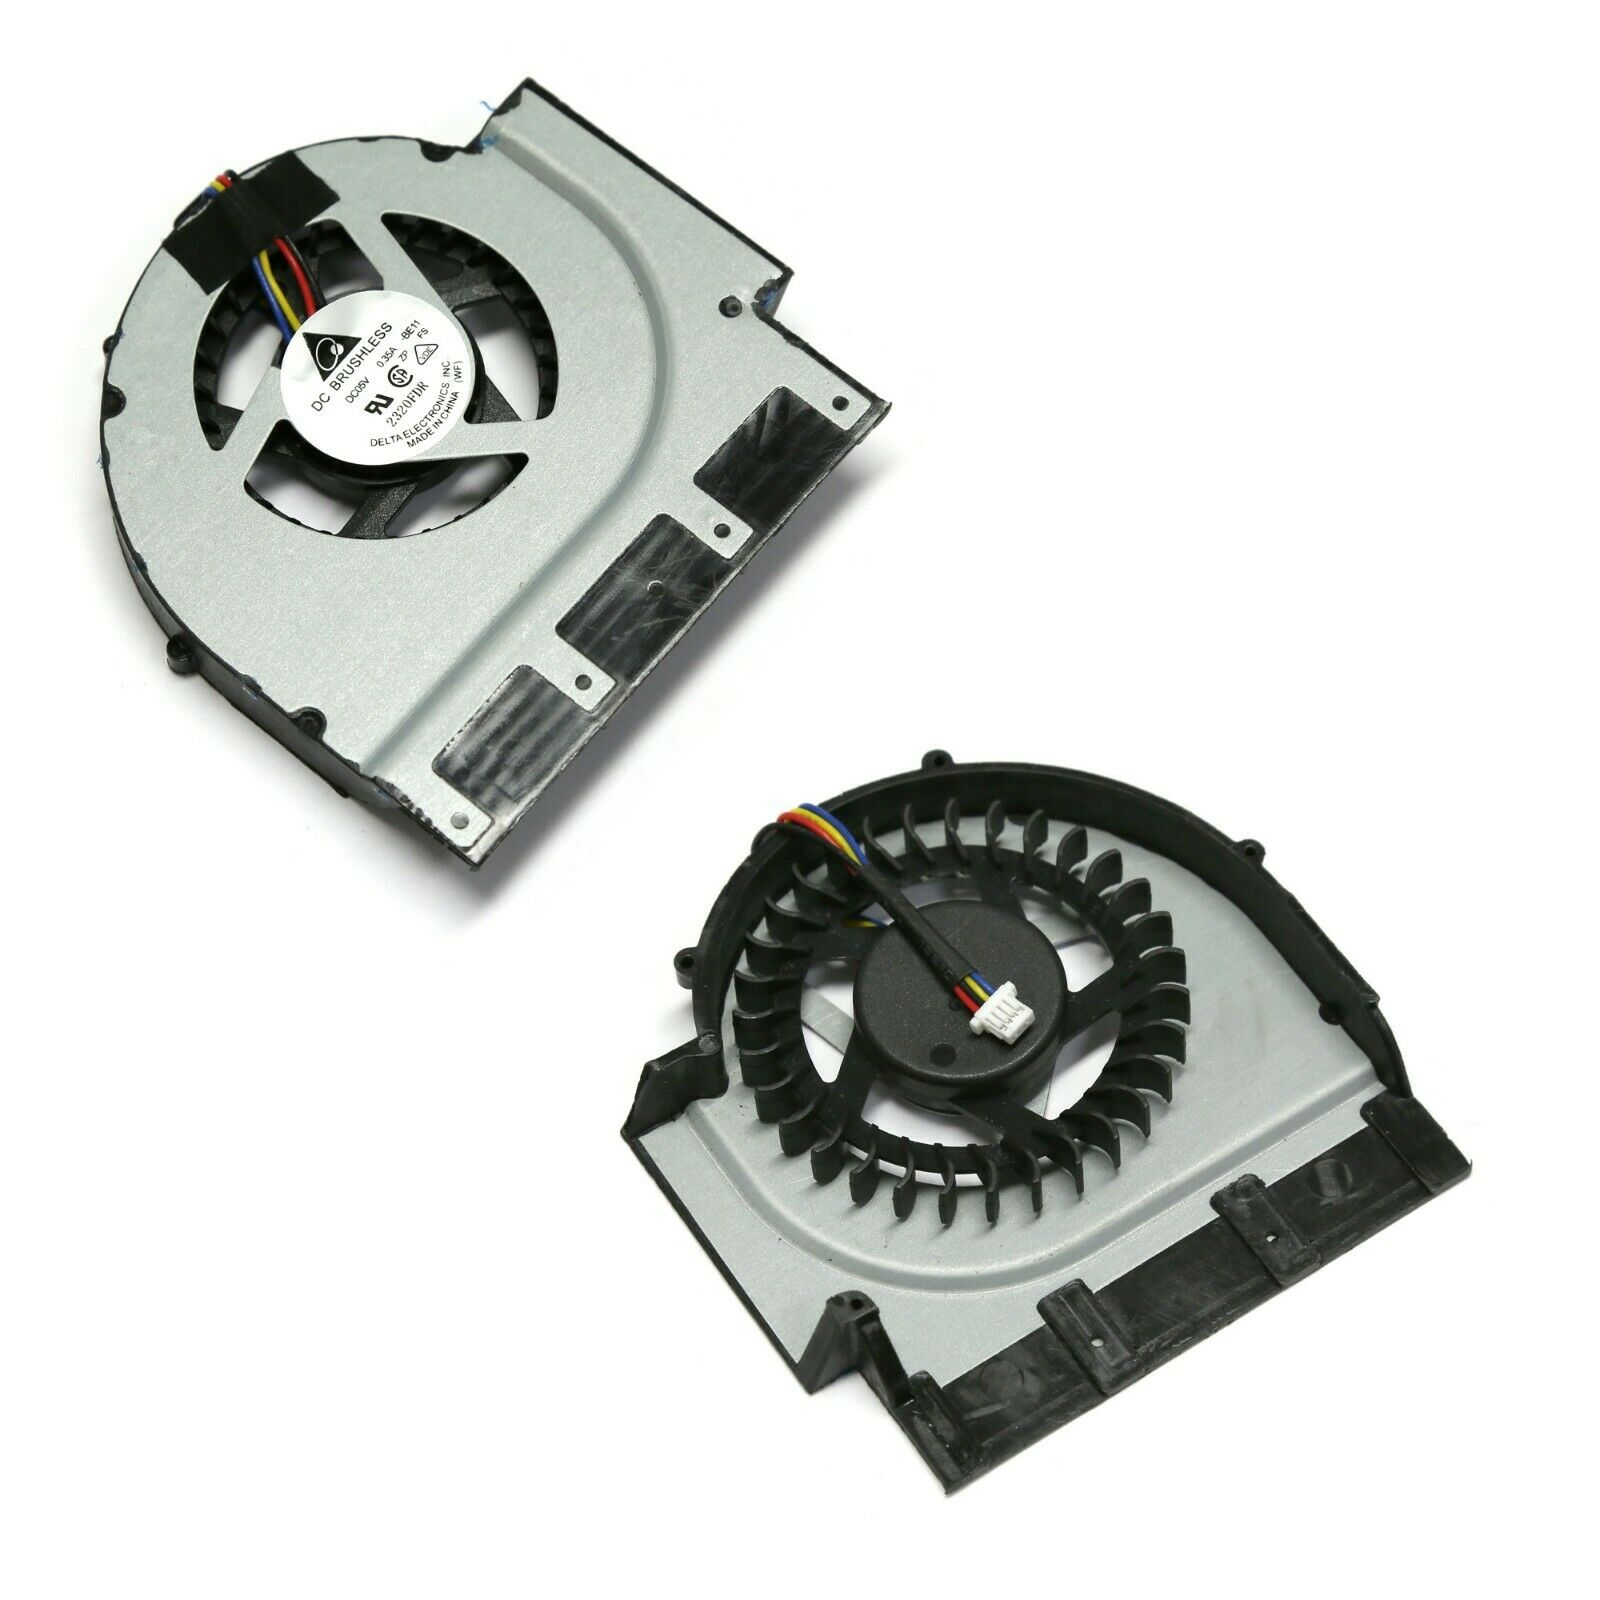 New CPU Cooler Fan For Lenovo ThinkPad T520 T520I W520 W530 04W1578 04W1579 04W0439 KSB06105HA AG10 0812r5h 001